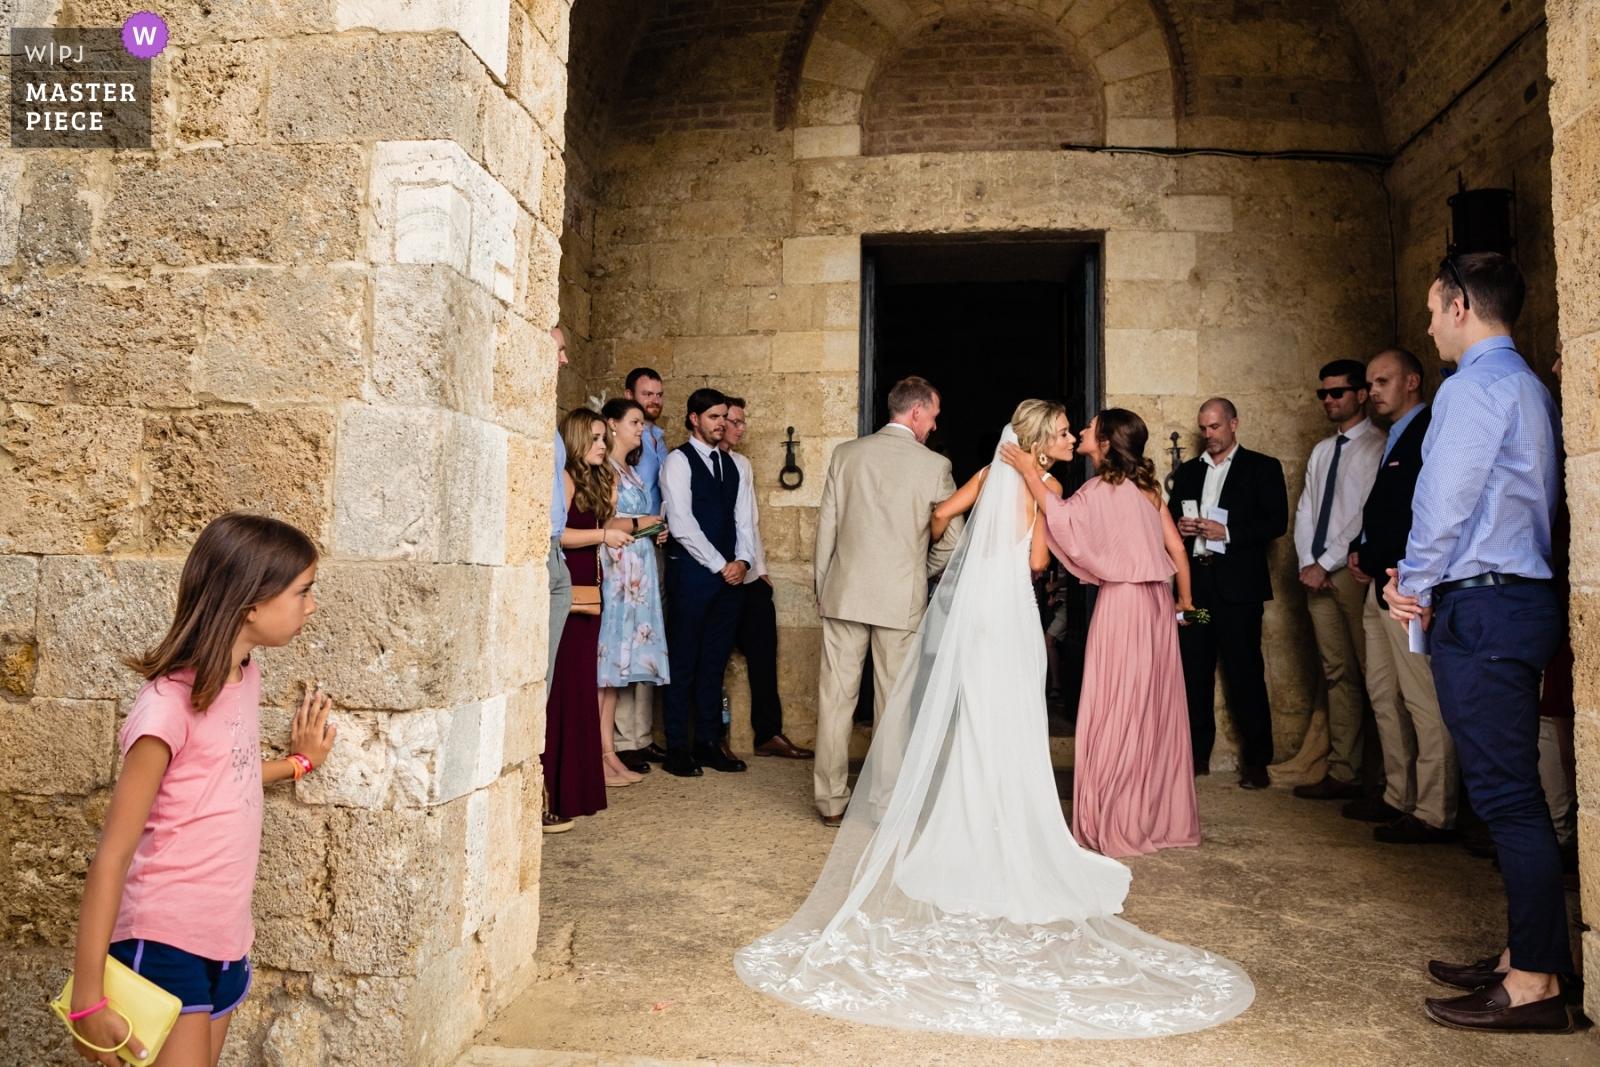 Tourist child peeps at bride outside church preparing to walk in, bridesmaid air kiss. - Dublin, Leinster Wedding Photography -  | San Galgano, Tuscany, Italy